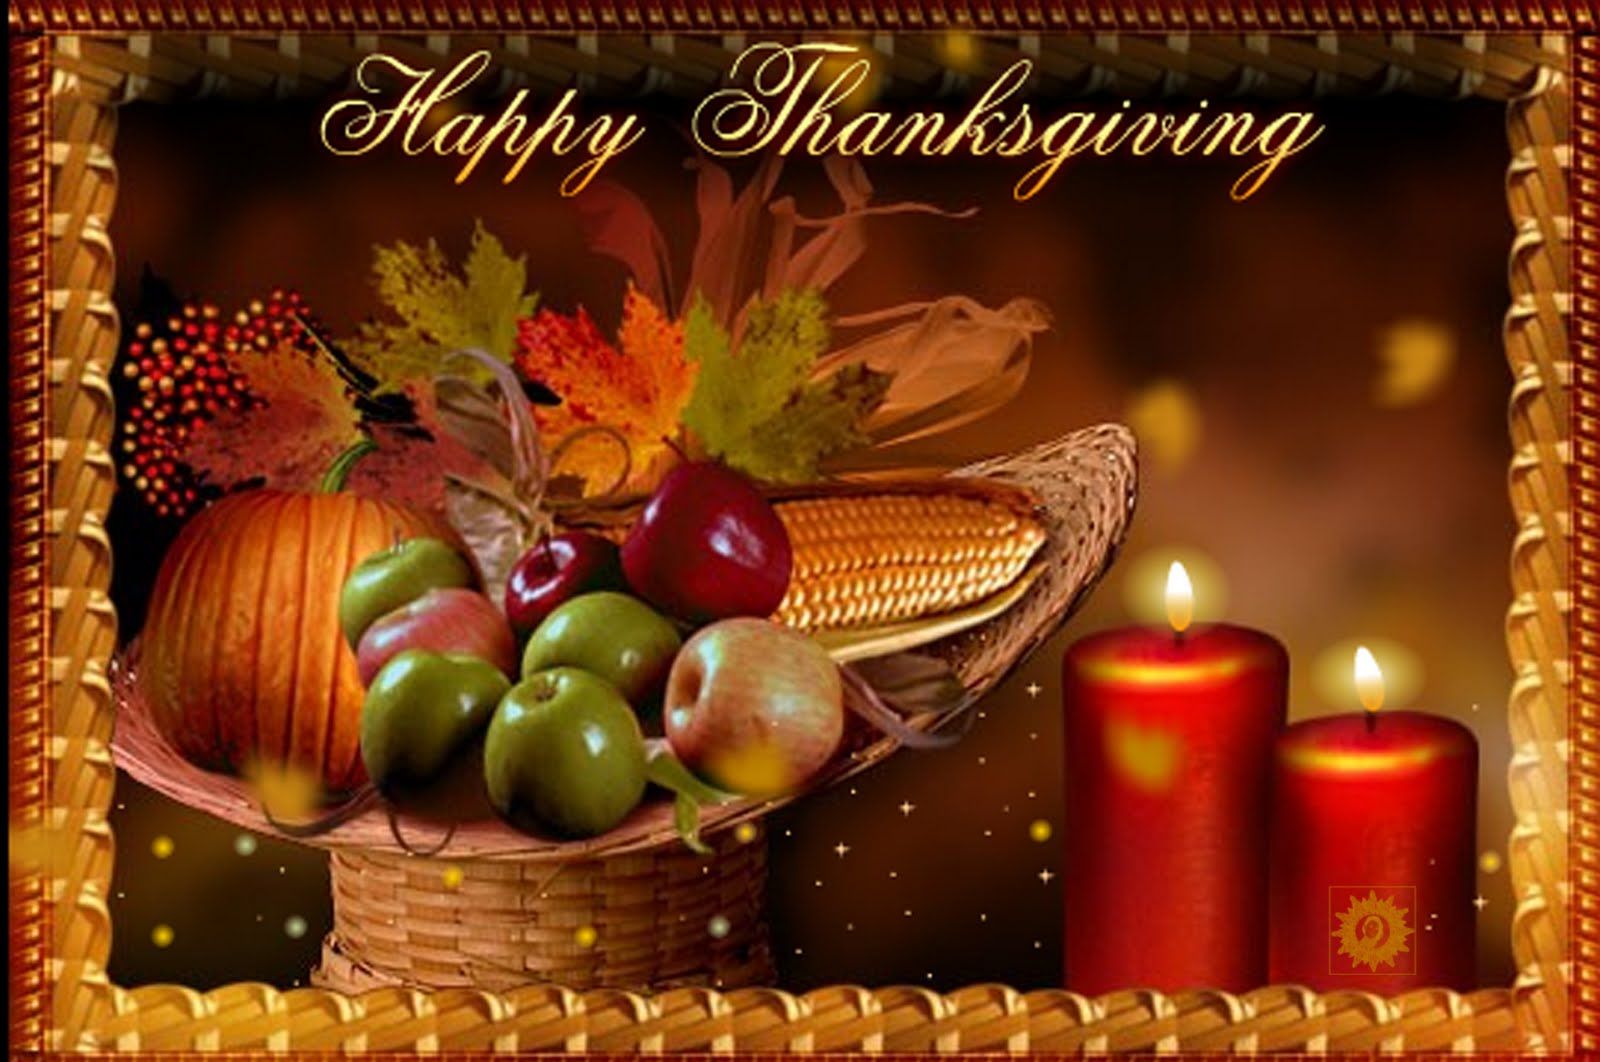 Thanksgiving Wallpaper Hd 16001062 22006 HD Wallpaper Res 1600x1062